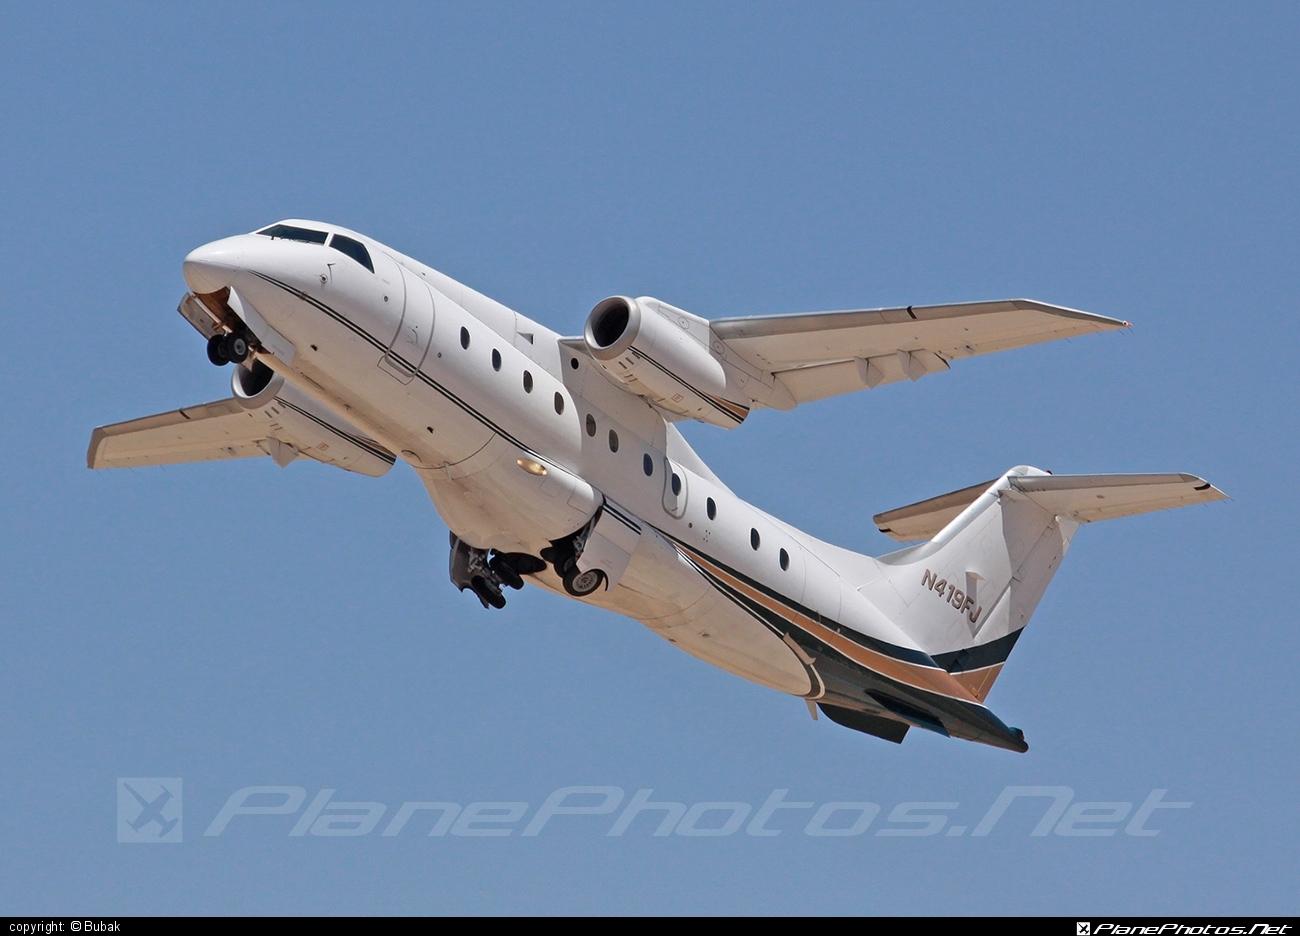 Fairchild-Dornier 328JET - N419FJ operated by Private operator #328jet #dornier328jet #fairchilddornier